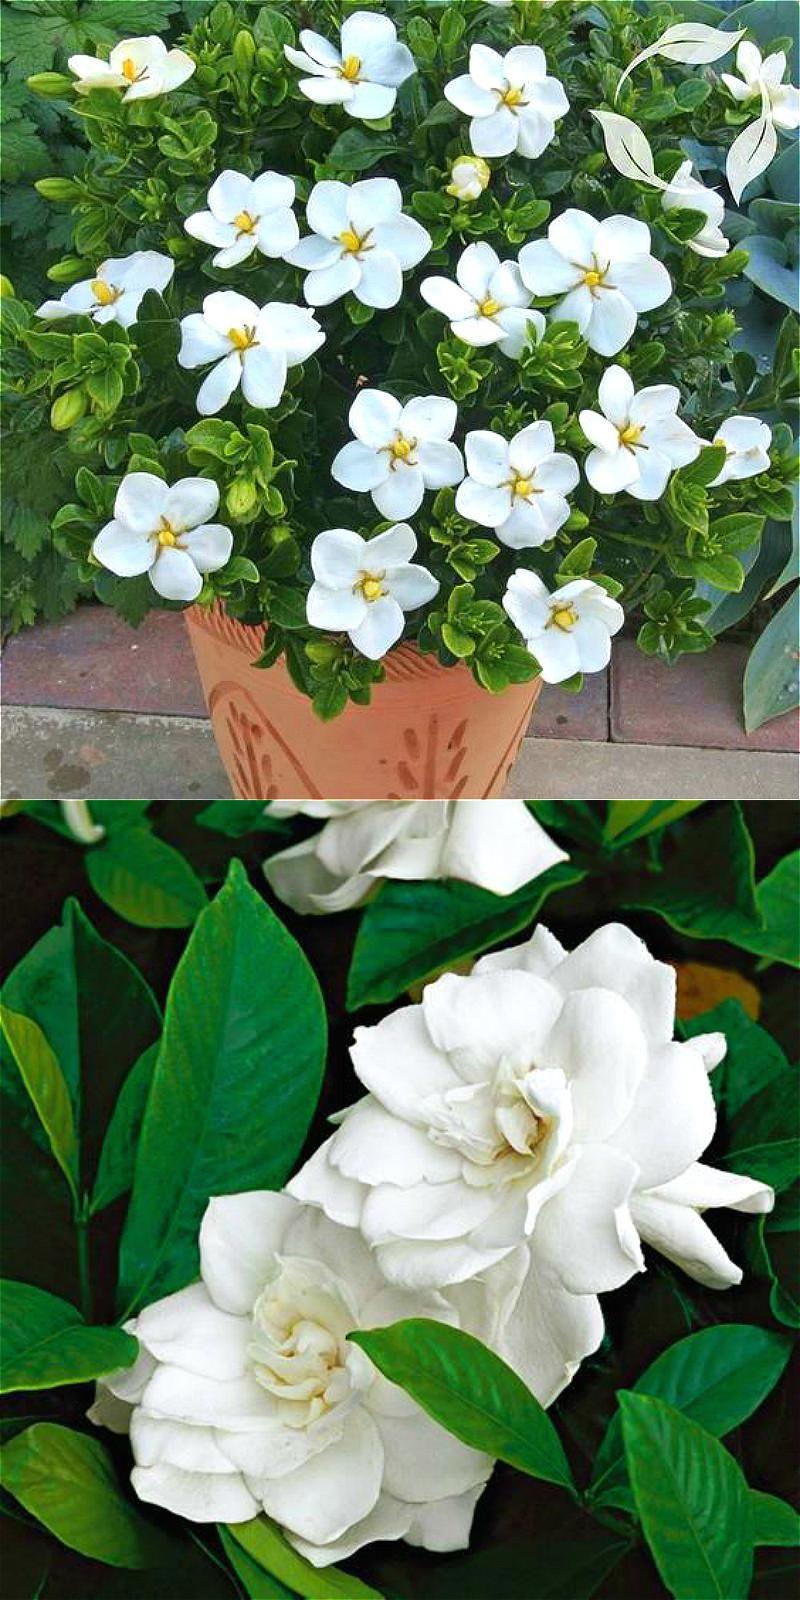 Visit to buy free shipping bonsai white jasmine flower seeds visit to buy free shipping bonsai white jasmine flower seeds fragrant plants arabian jasmine izmirmasajfo